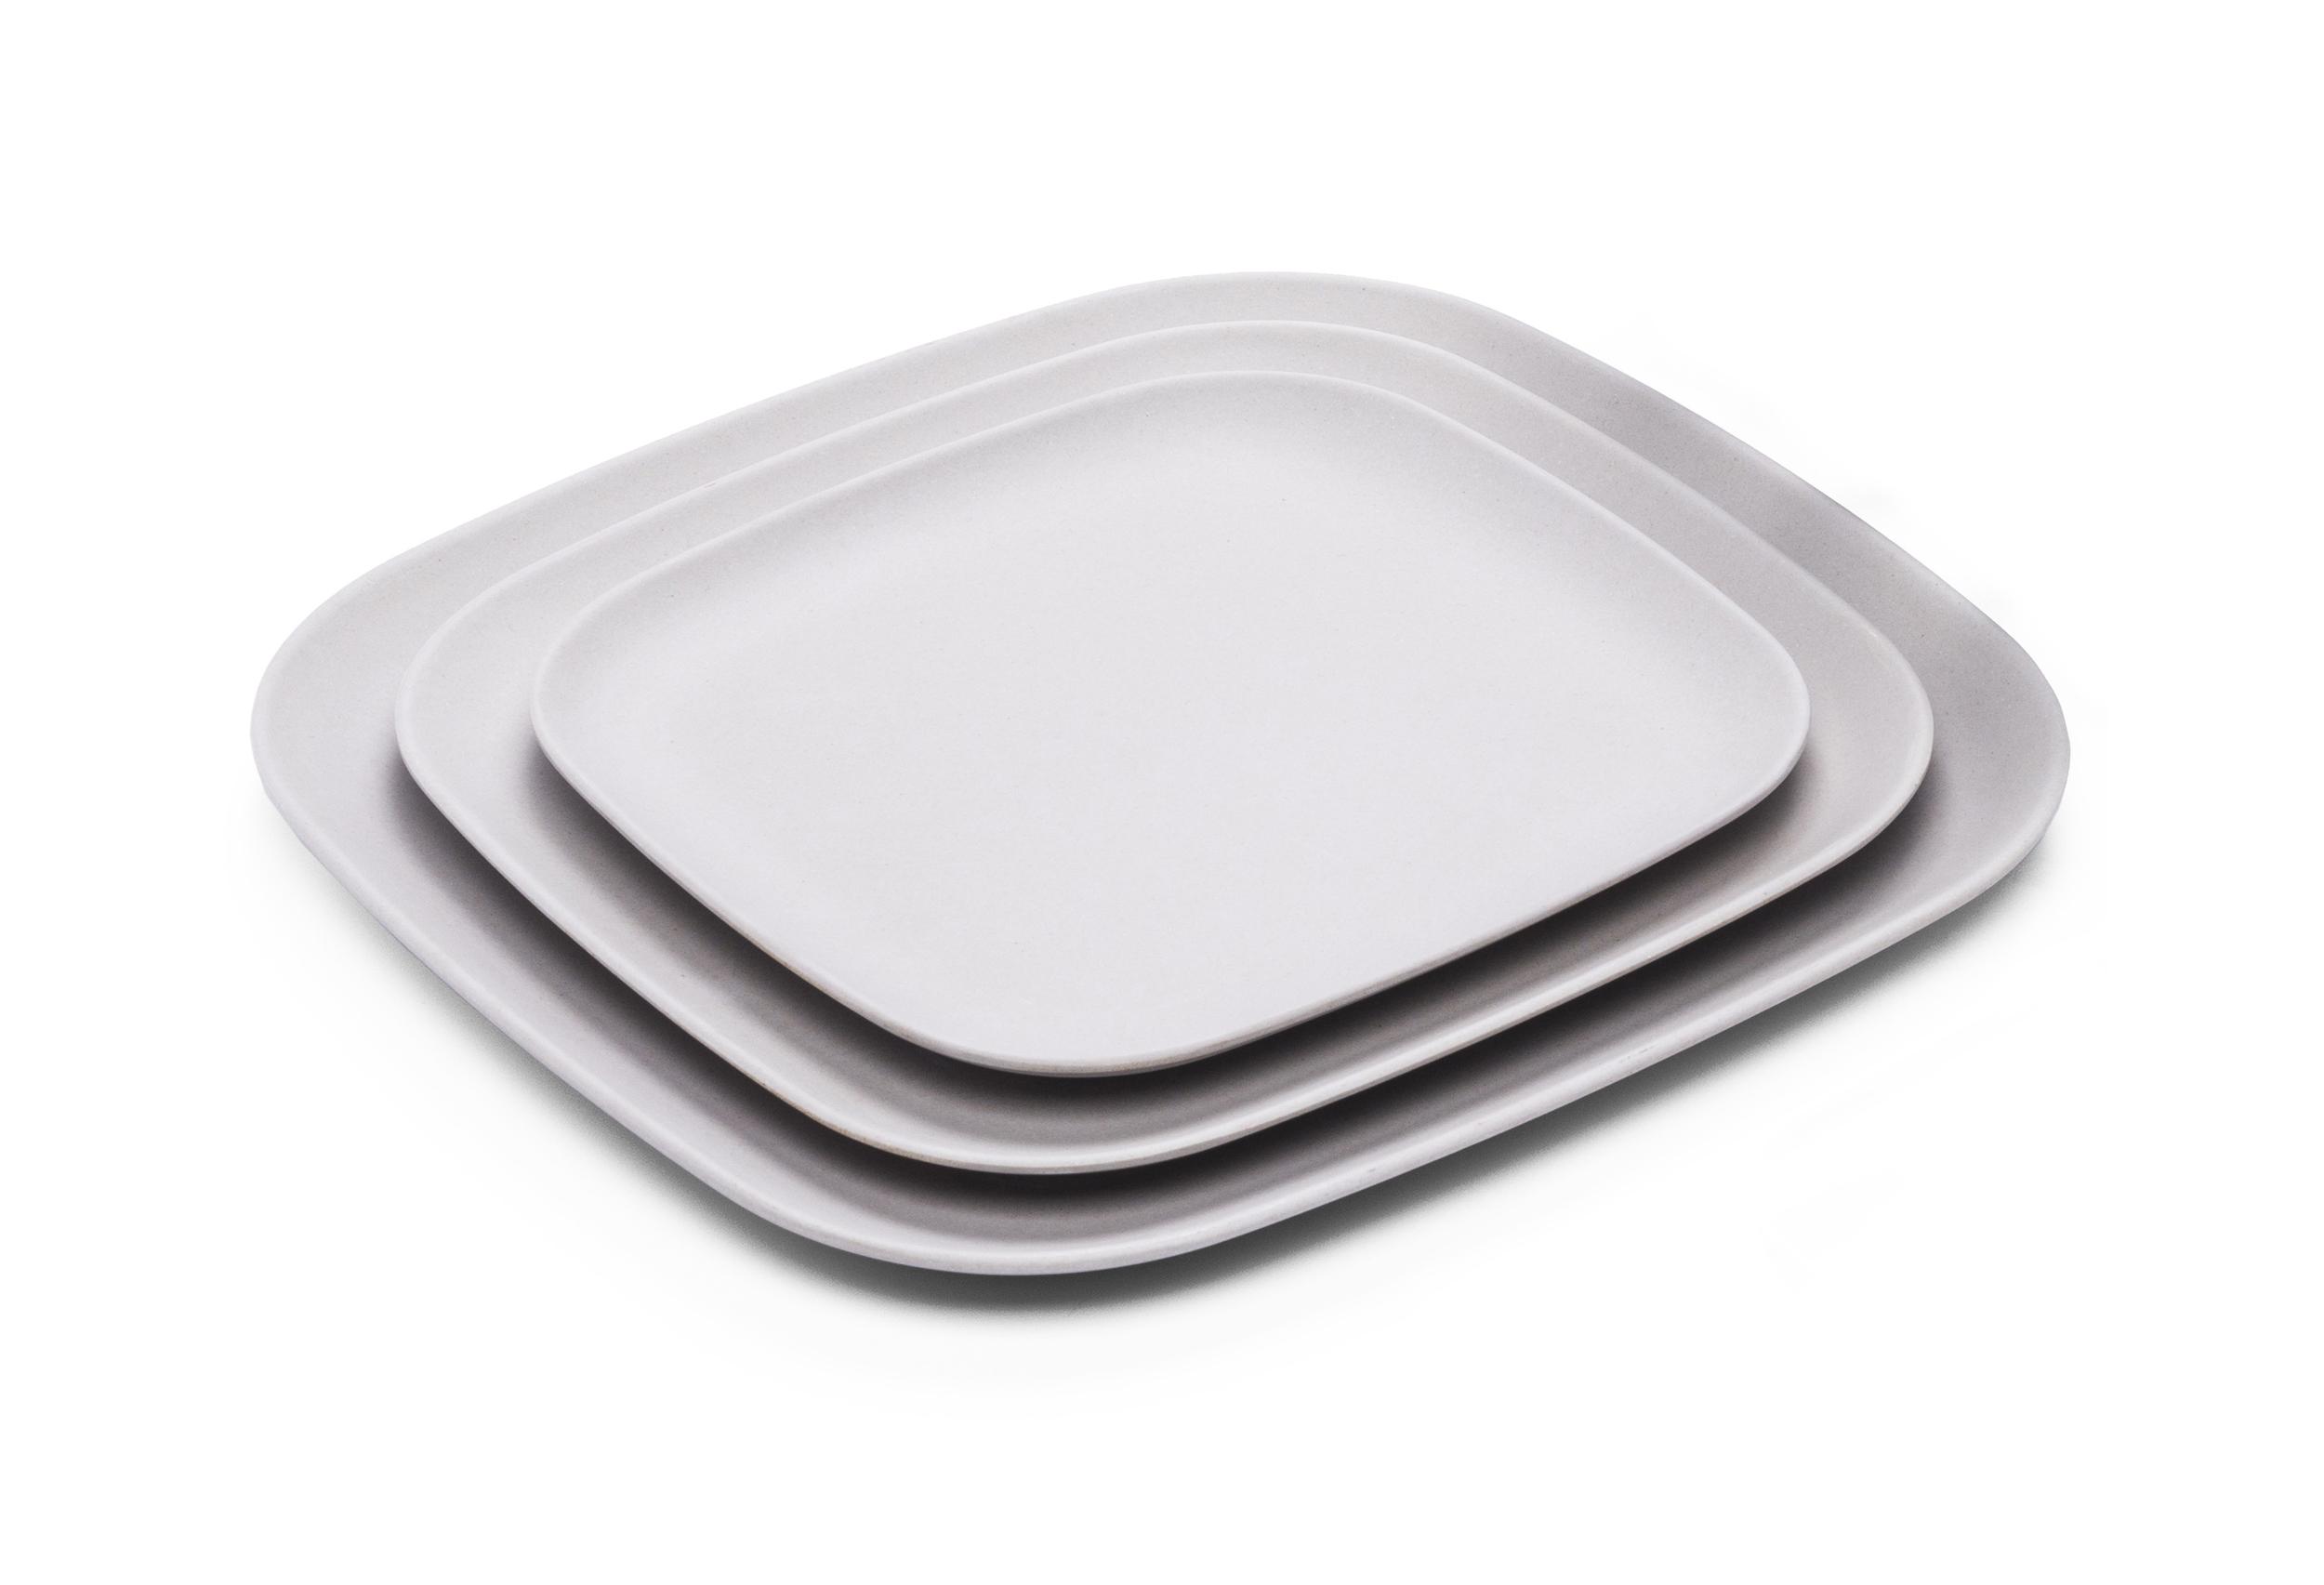 Dinnerware Plates Placesetting